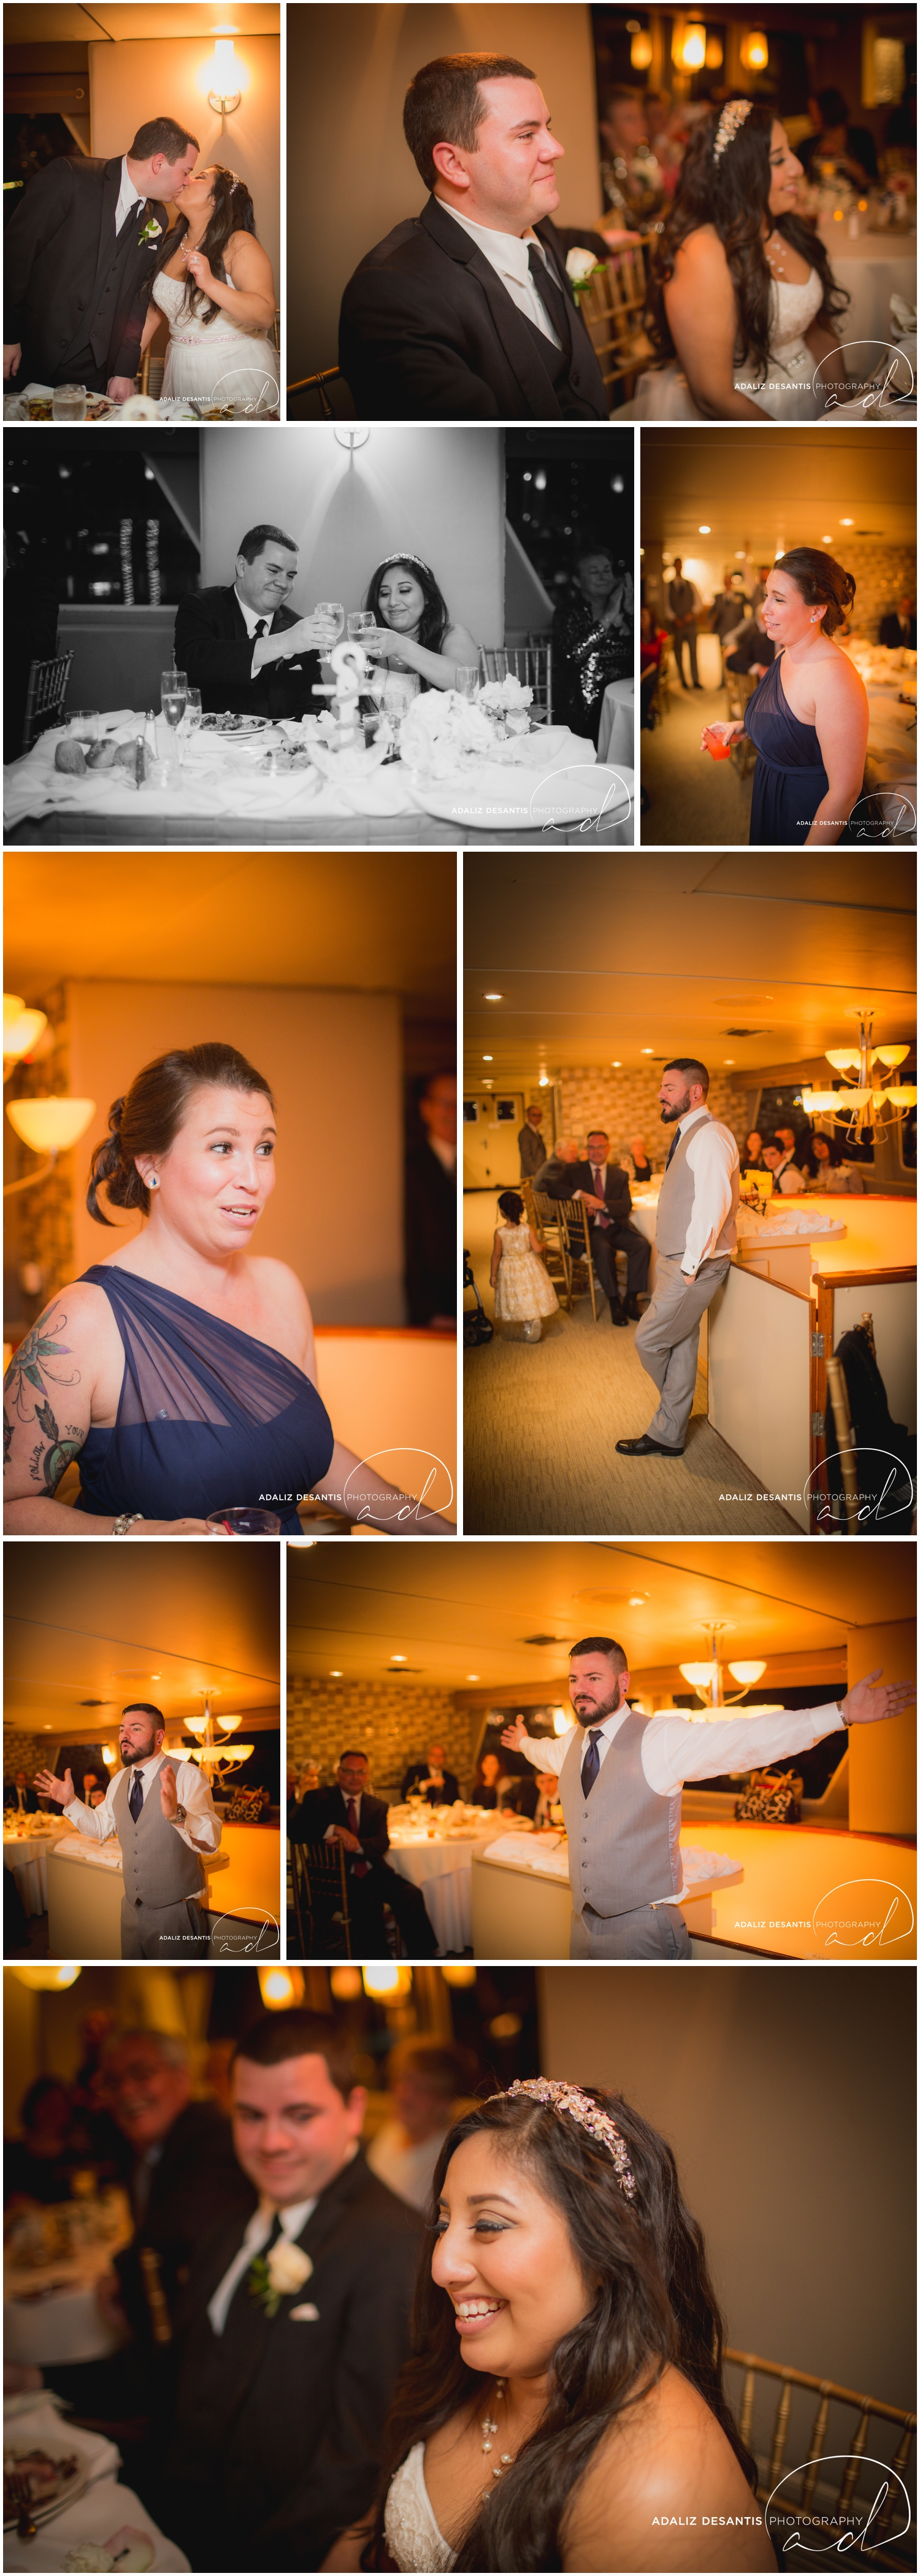 Taylor and amanda Indiana Fort Lauderdale Sun Dream yacht charter wedding 21